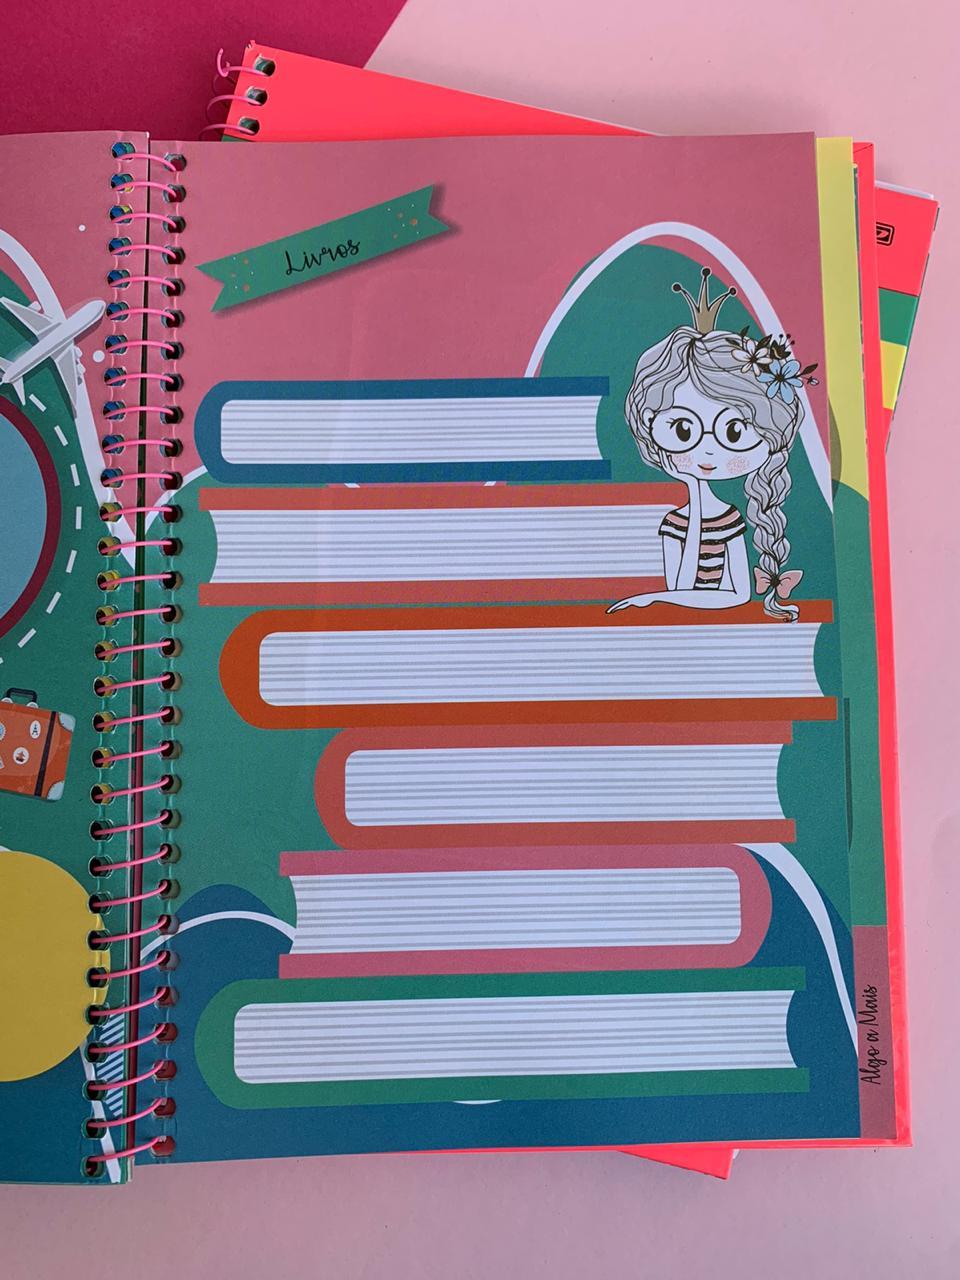 Agenda My Dear Planner Permanente Melancia | São Domingos